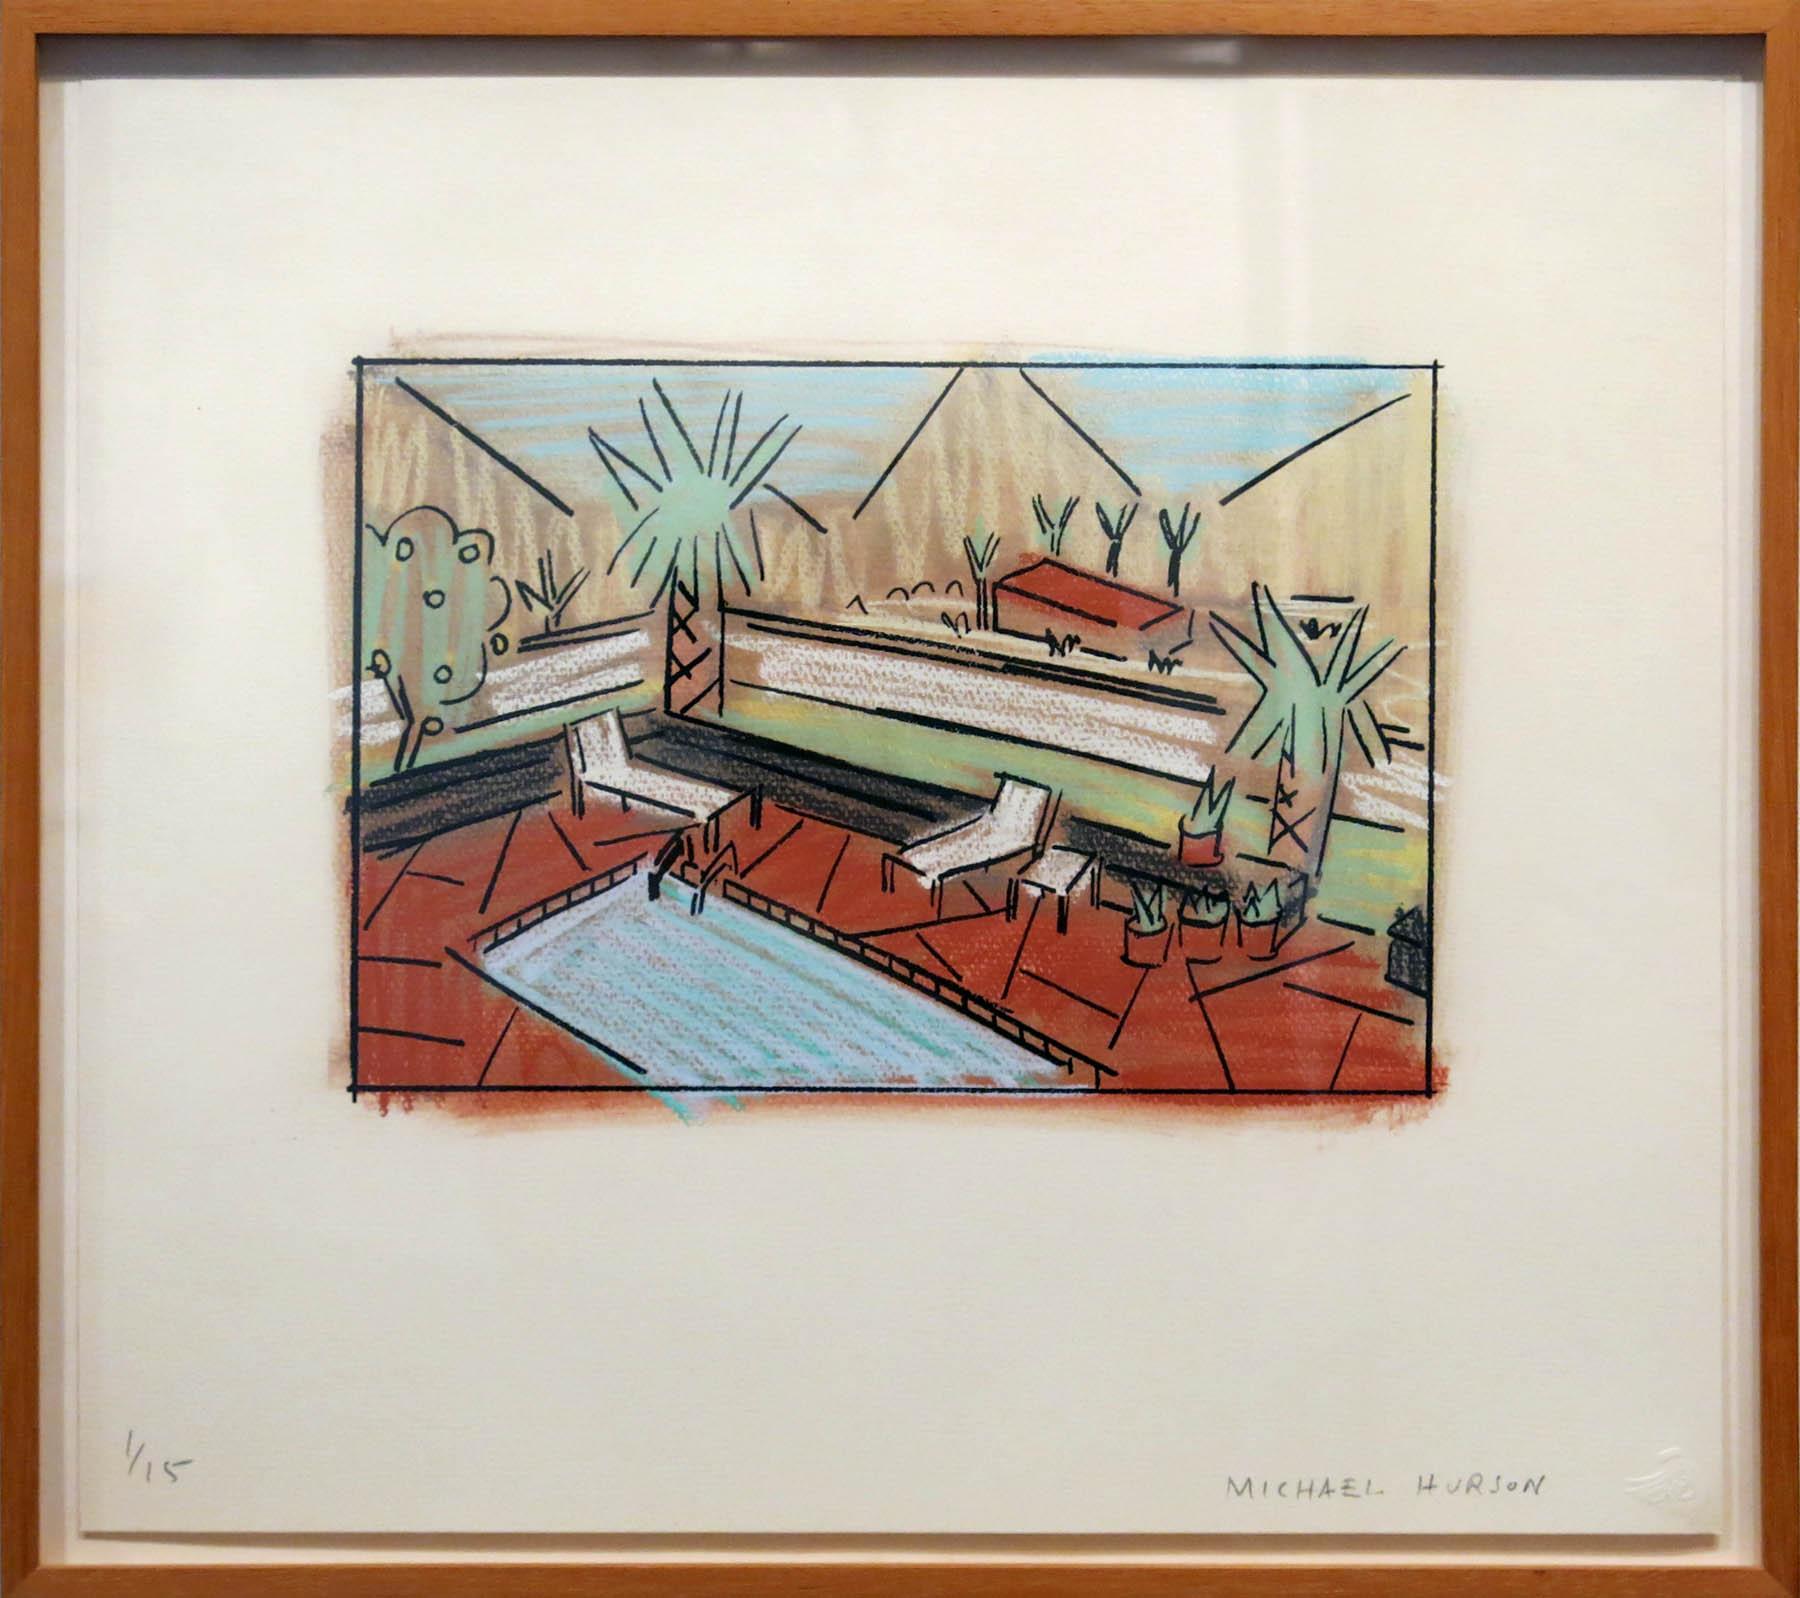 Michael Hurson, Palm Springs, c. late 1970s, Print, ed. 1/15, 16.5h x 18.5w in. (framed)